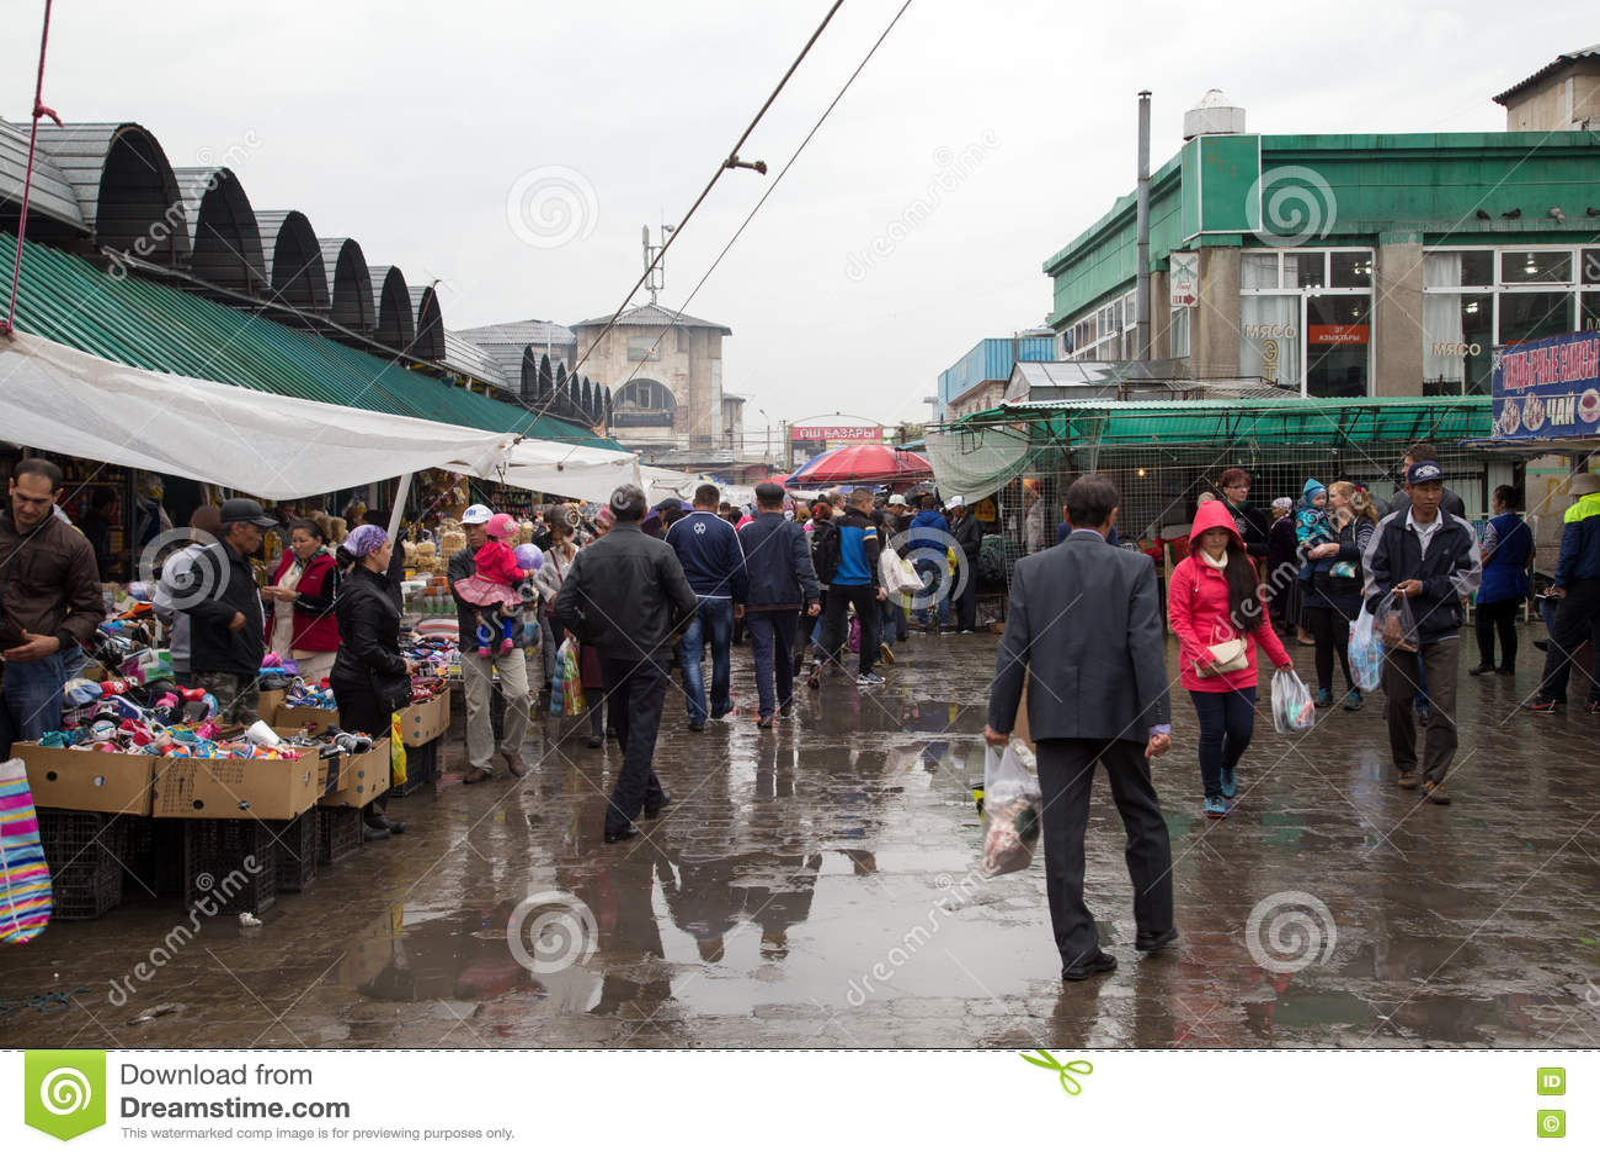 Osh Bazaar In Bishkek, Kyrgyzstan Editorial Image - Image of